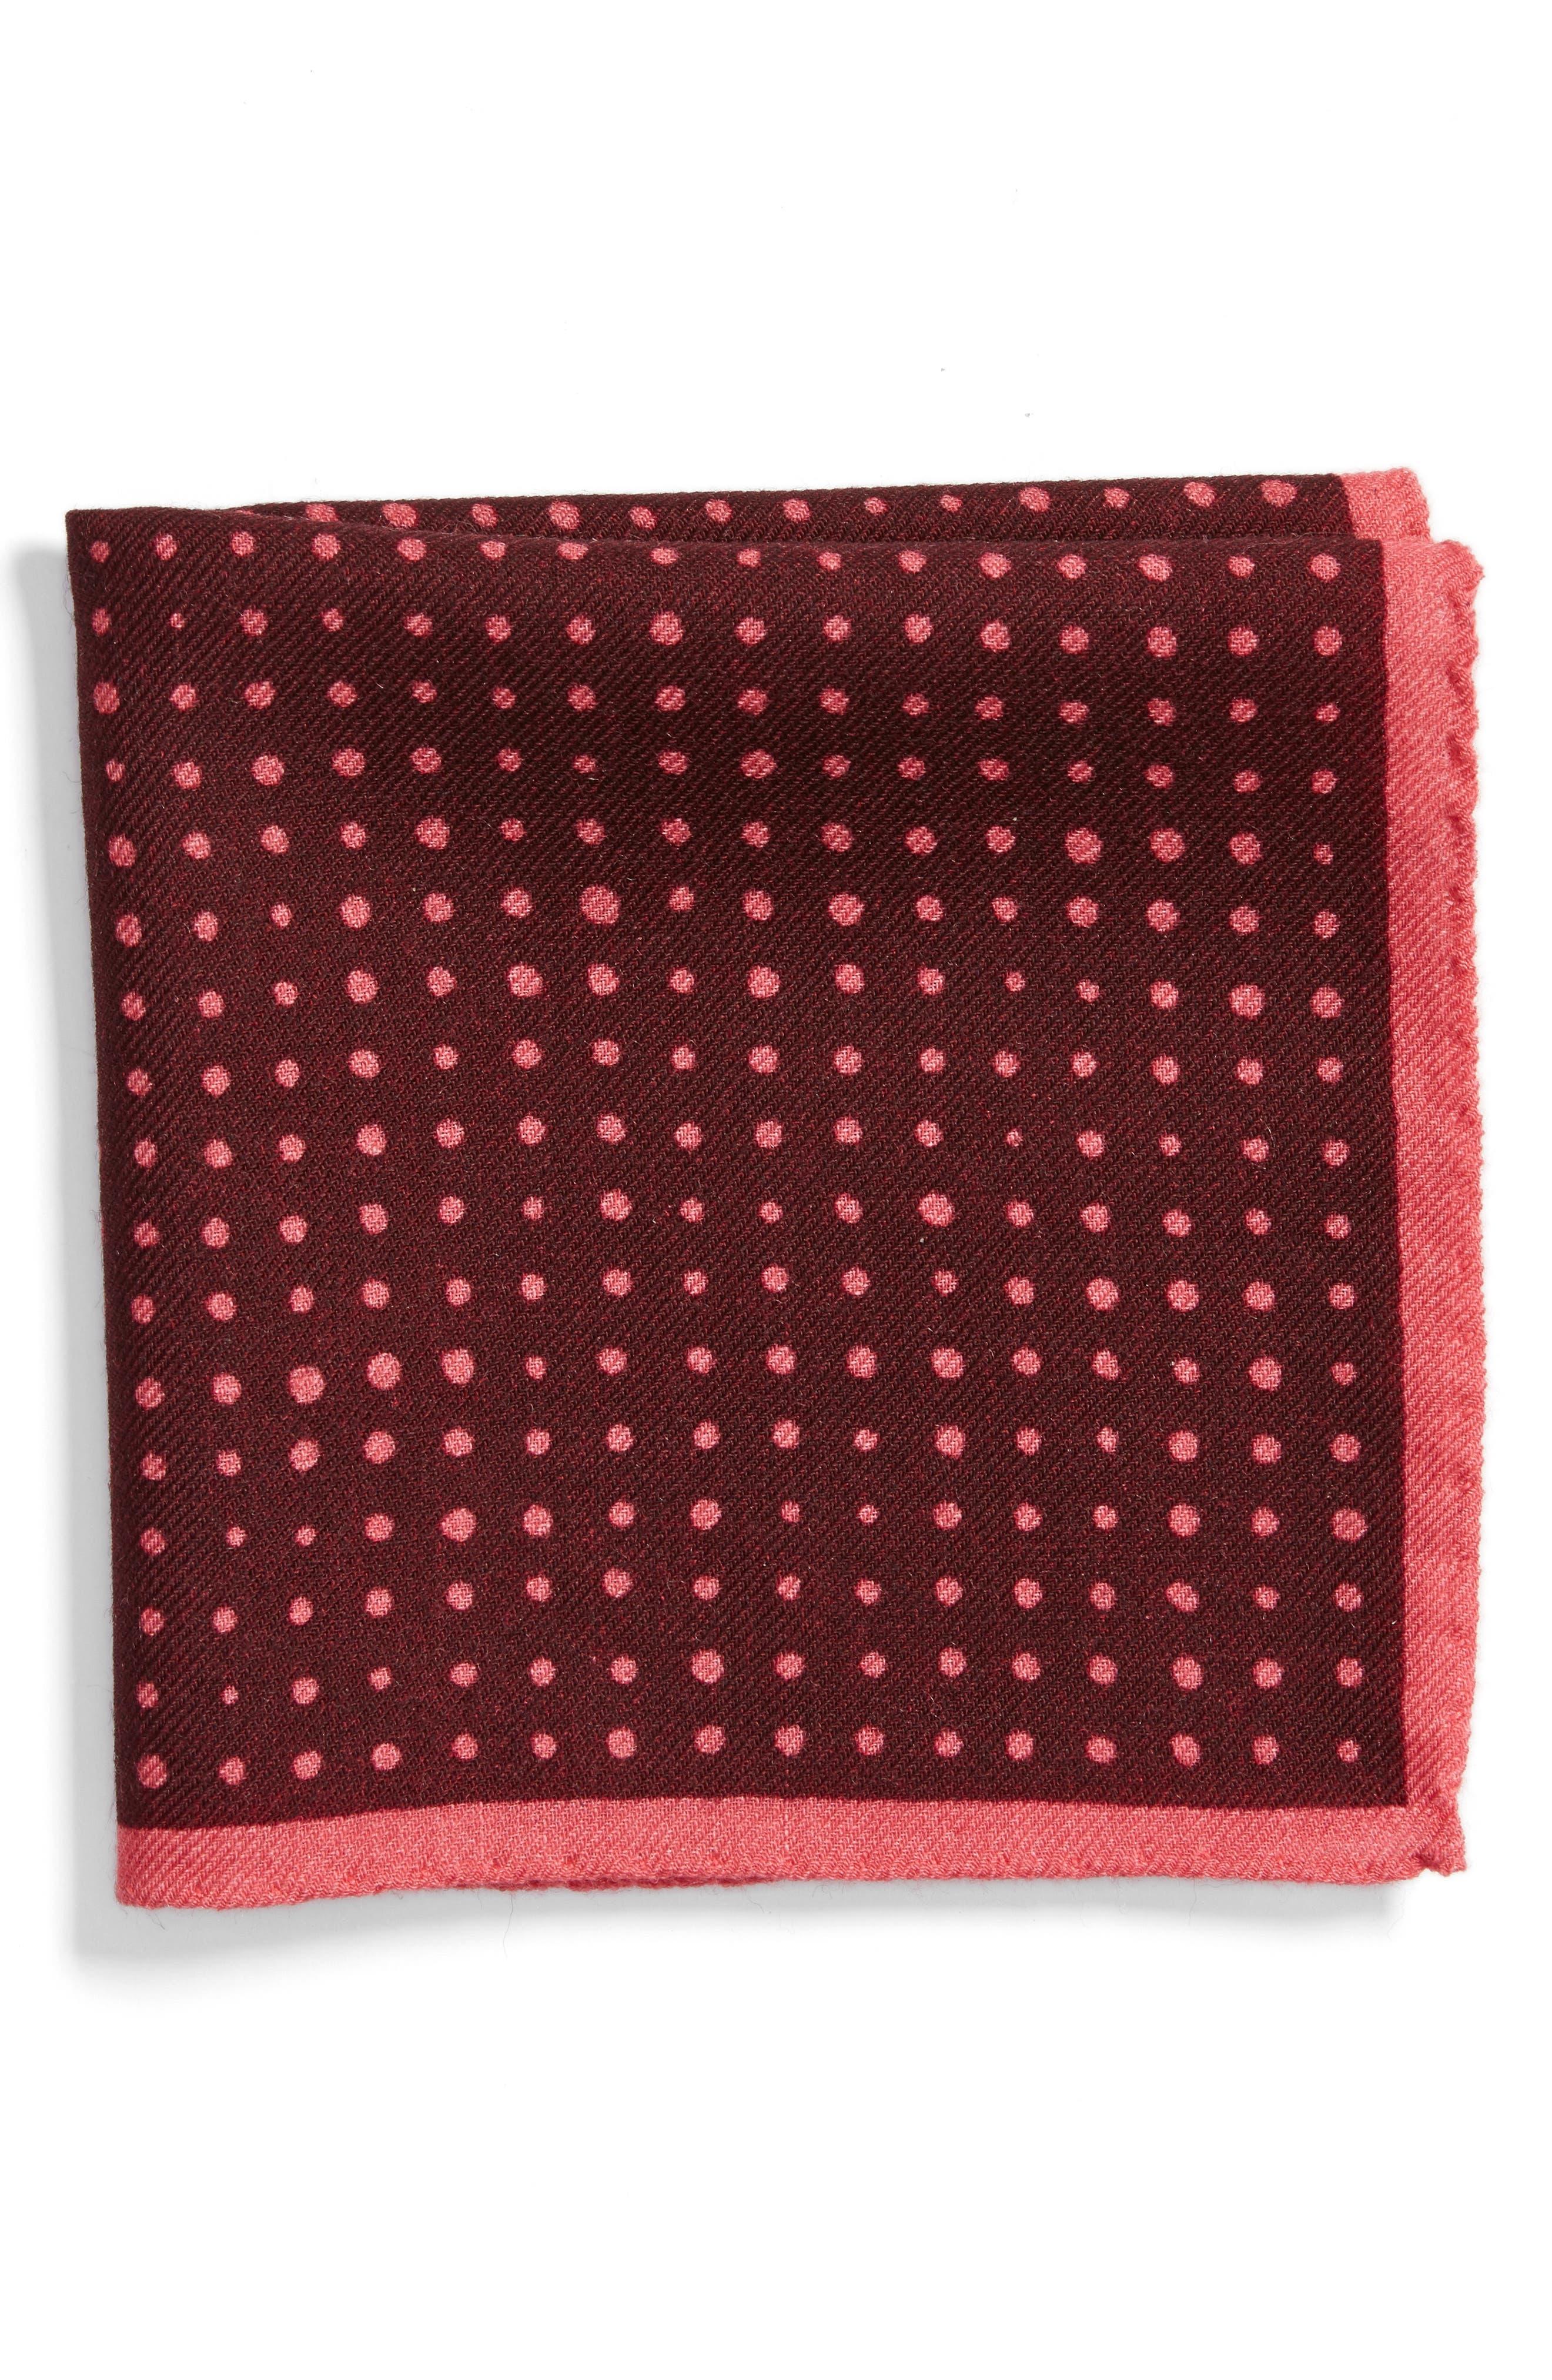 Bonobos Tivoli Dot Wool Pocket Square